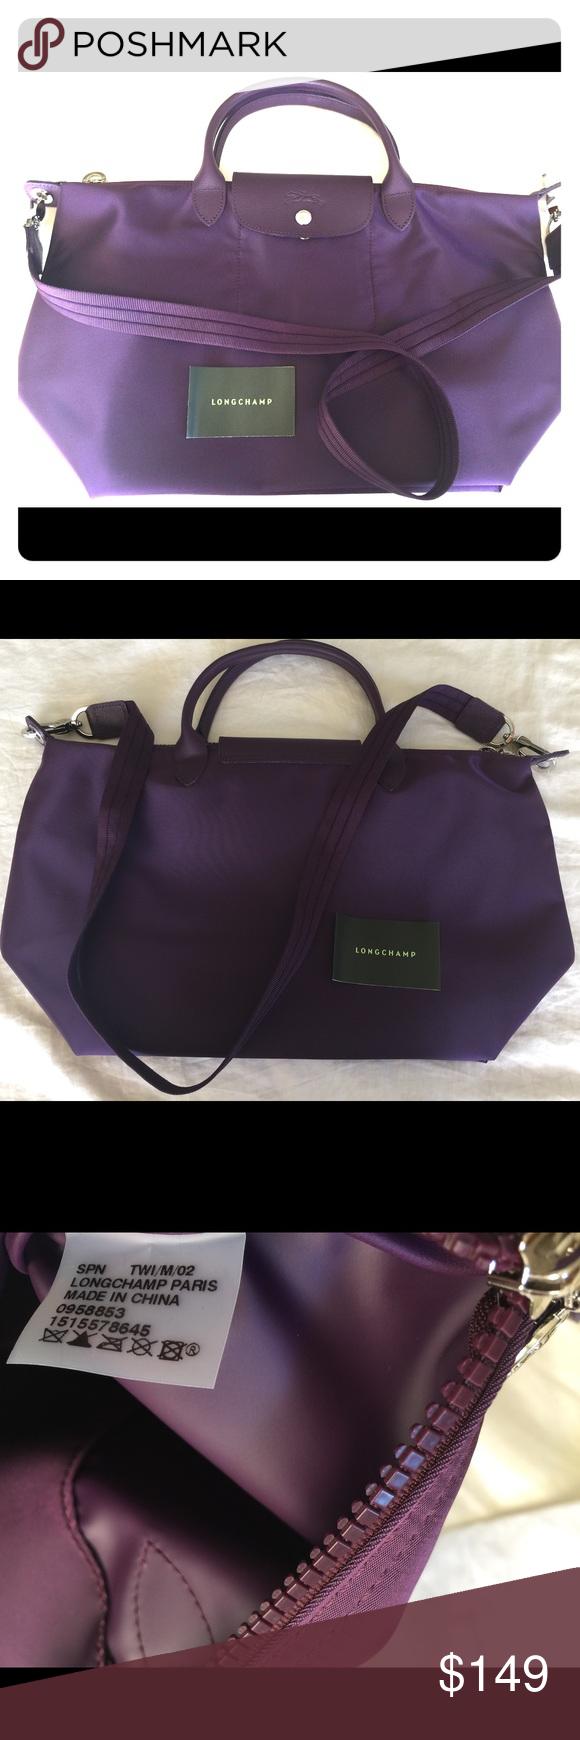 0d4d5996379e Longchamp Le Pliage Neo Medium Handbag Bilberry 💯 % Authentic Longchamp Le  Pliage Neo Medium Handbag Bilberry 1515578645. Brand new! Longchamp Bags  Totes